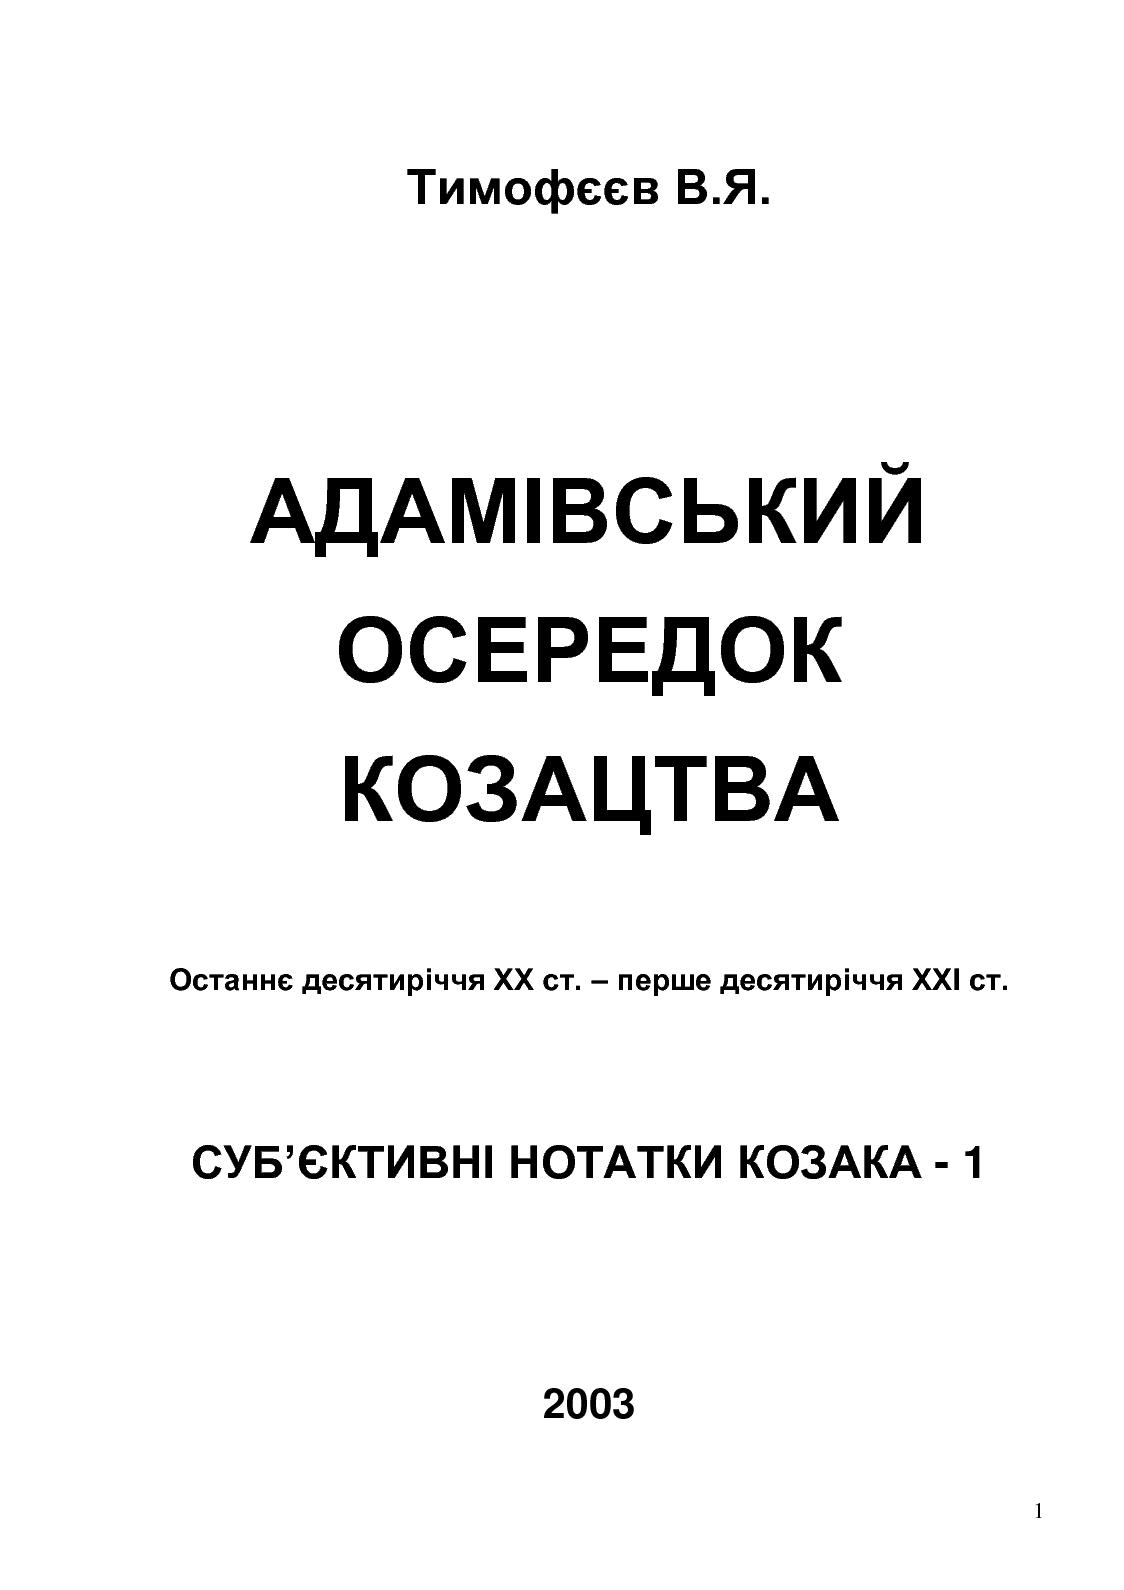 Calaméo - 11А 1988-2003 АДАМІВСЬКИЙ ОСЕРЕДОК КОЗАЦТВА 1-3ч 3a7252e36c32b